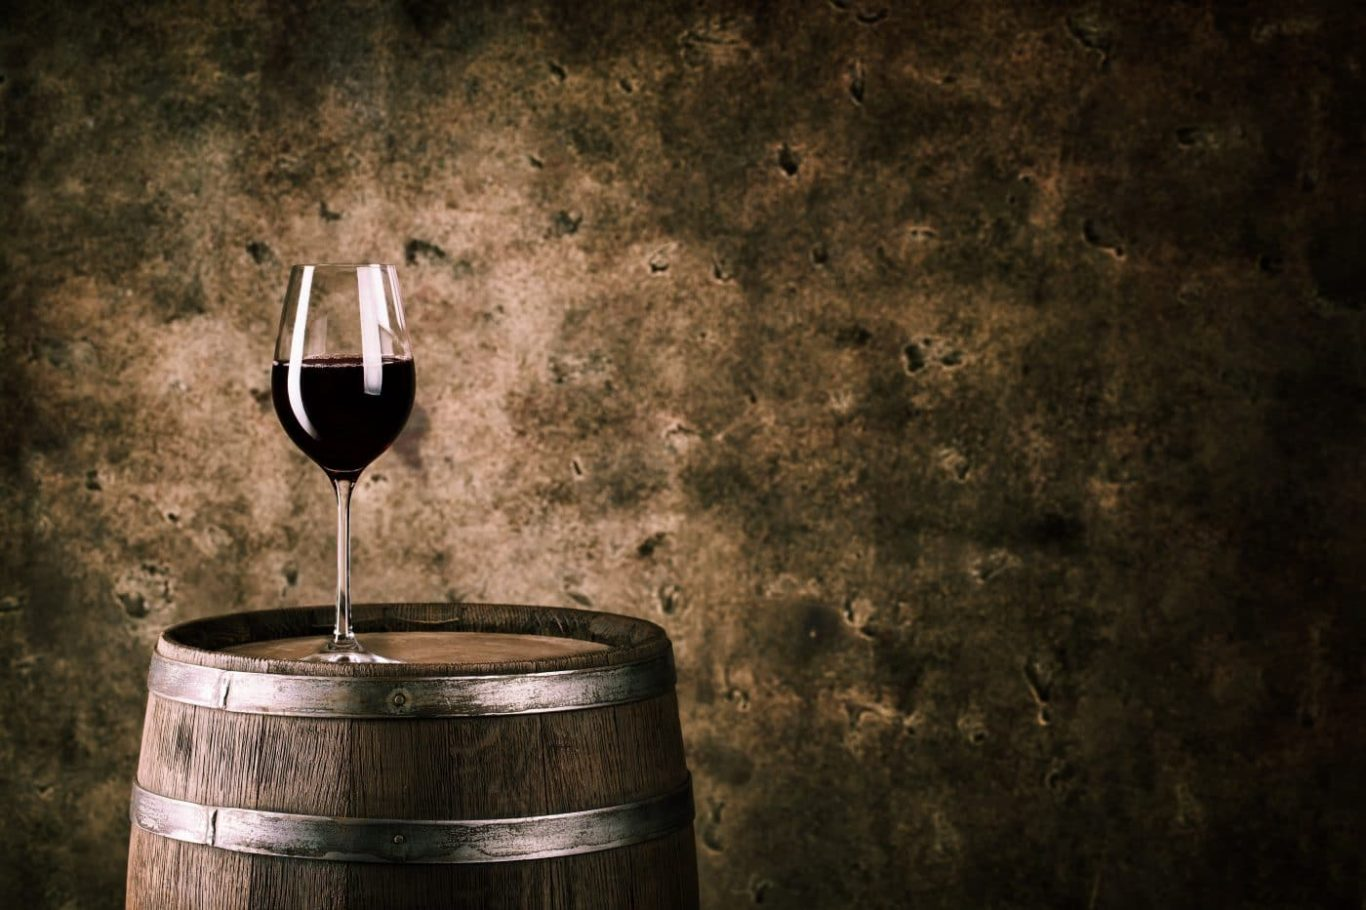 Ein leckeres Glas Rotwein